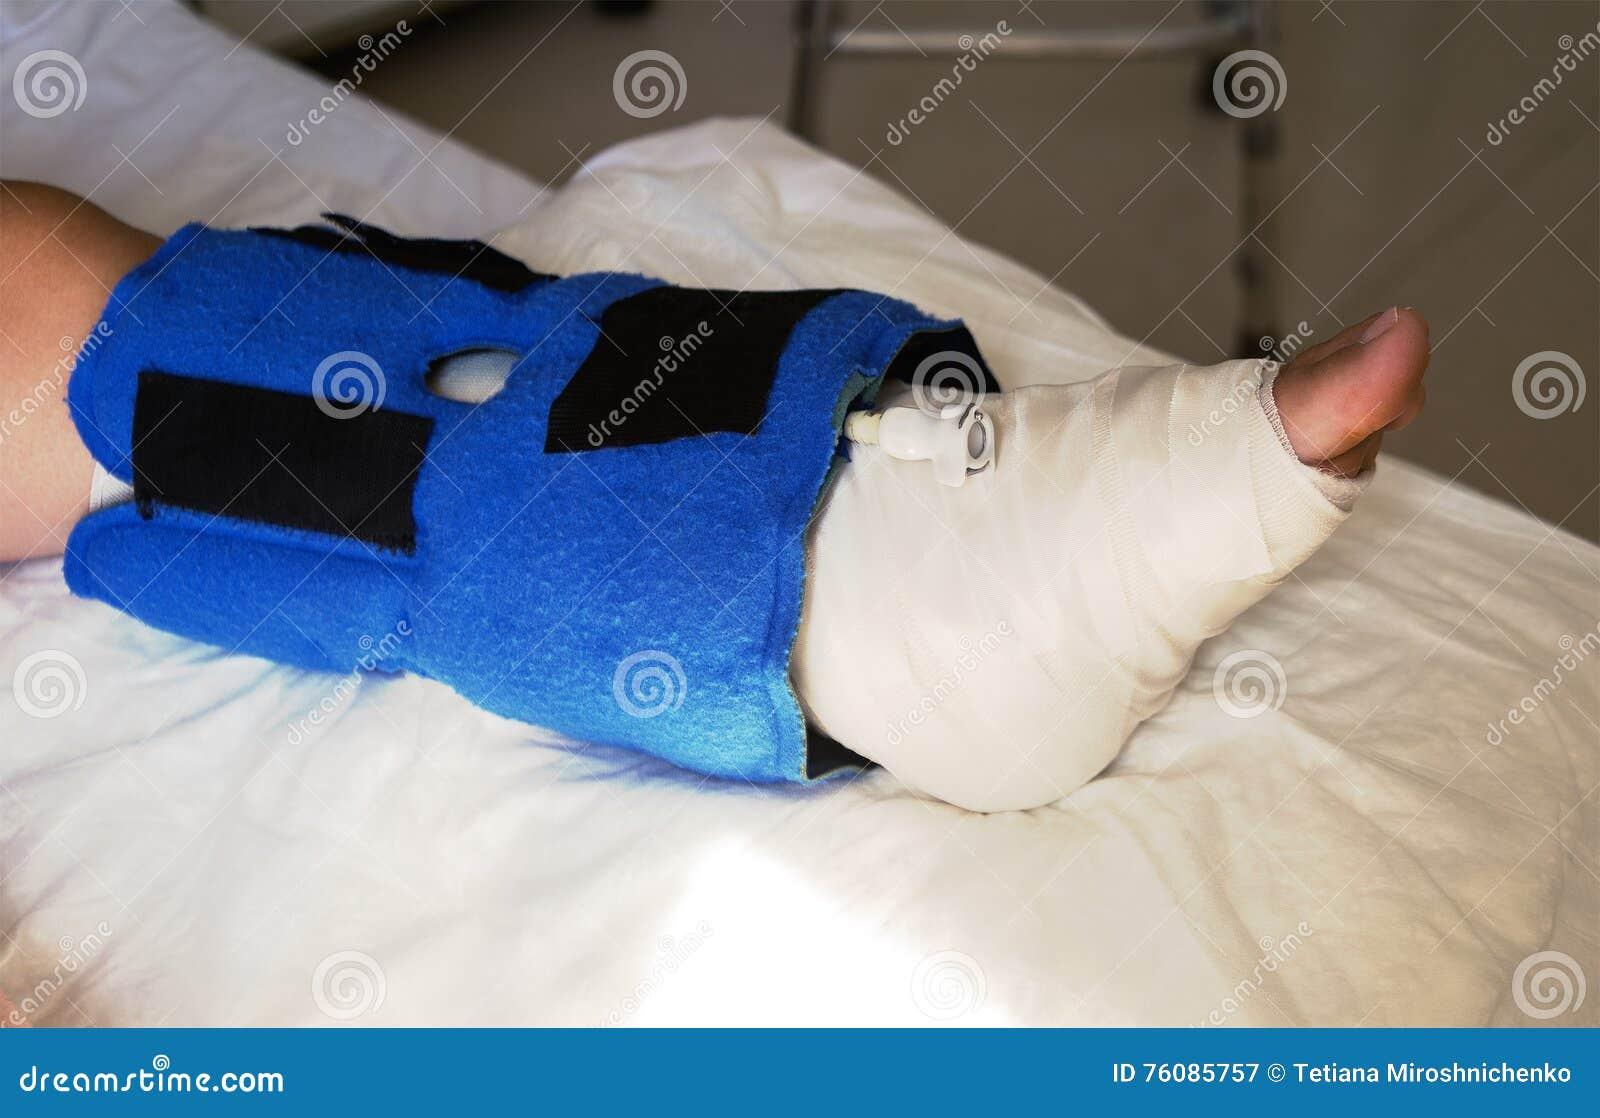 Gamba rotta e bendato